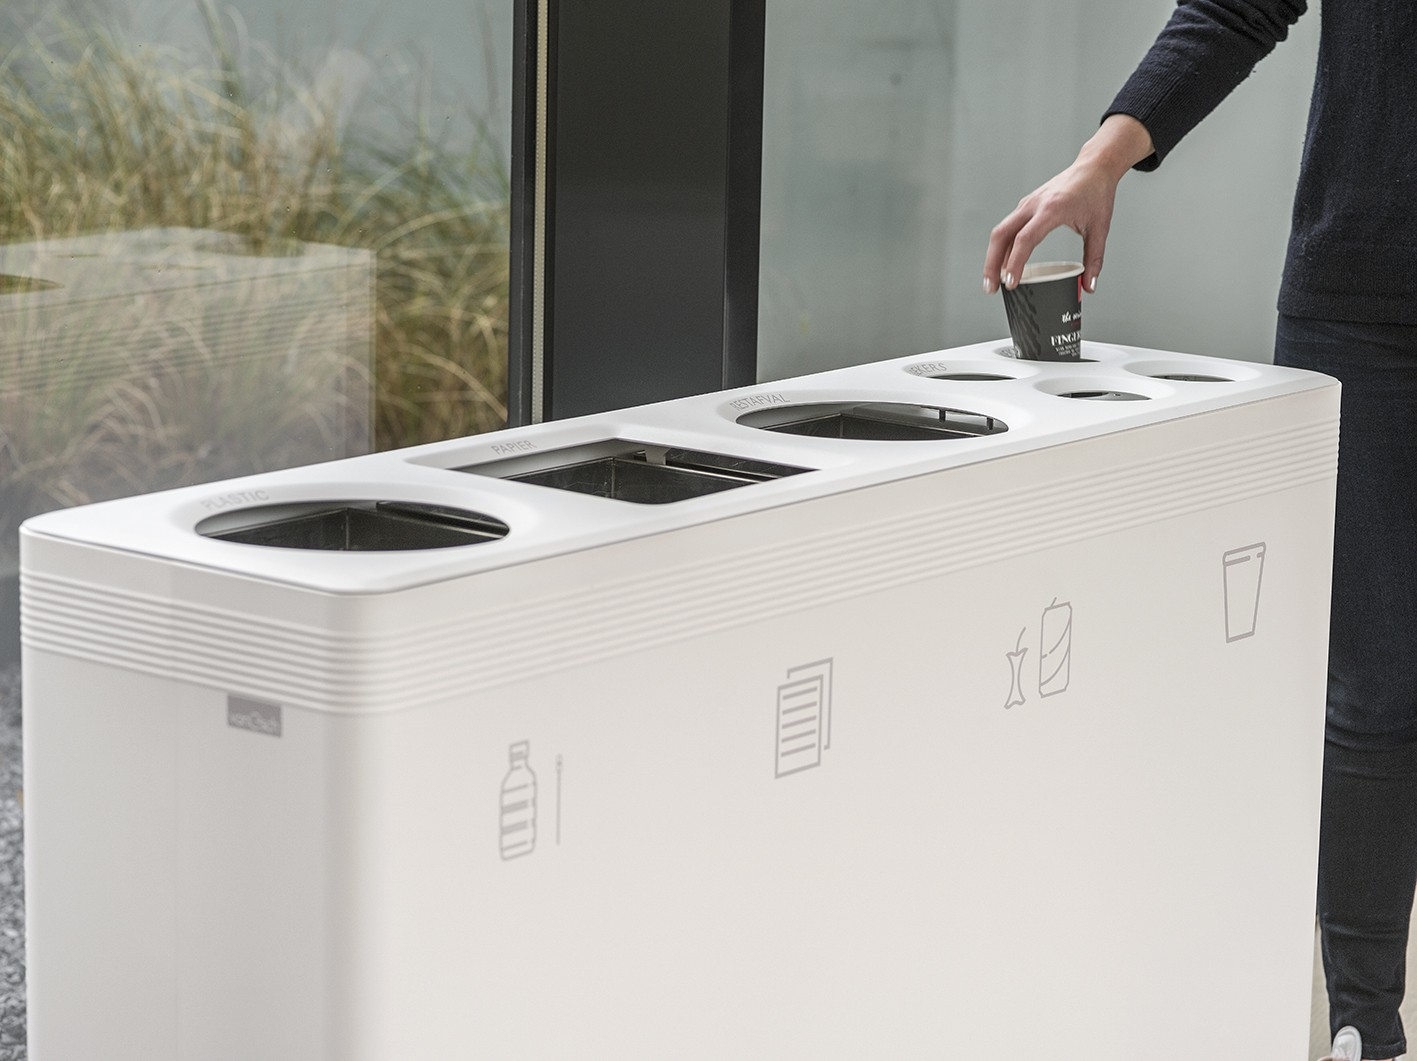 Ditch, Abfalltrennsystem, Recycling Systeme Berlin